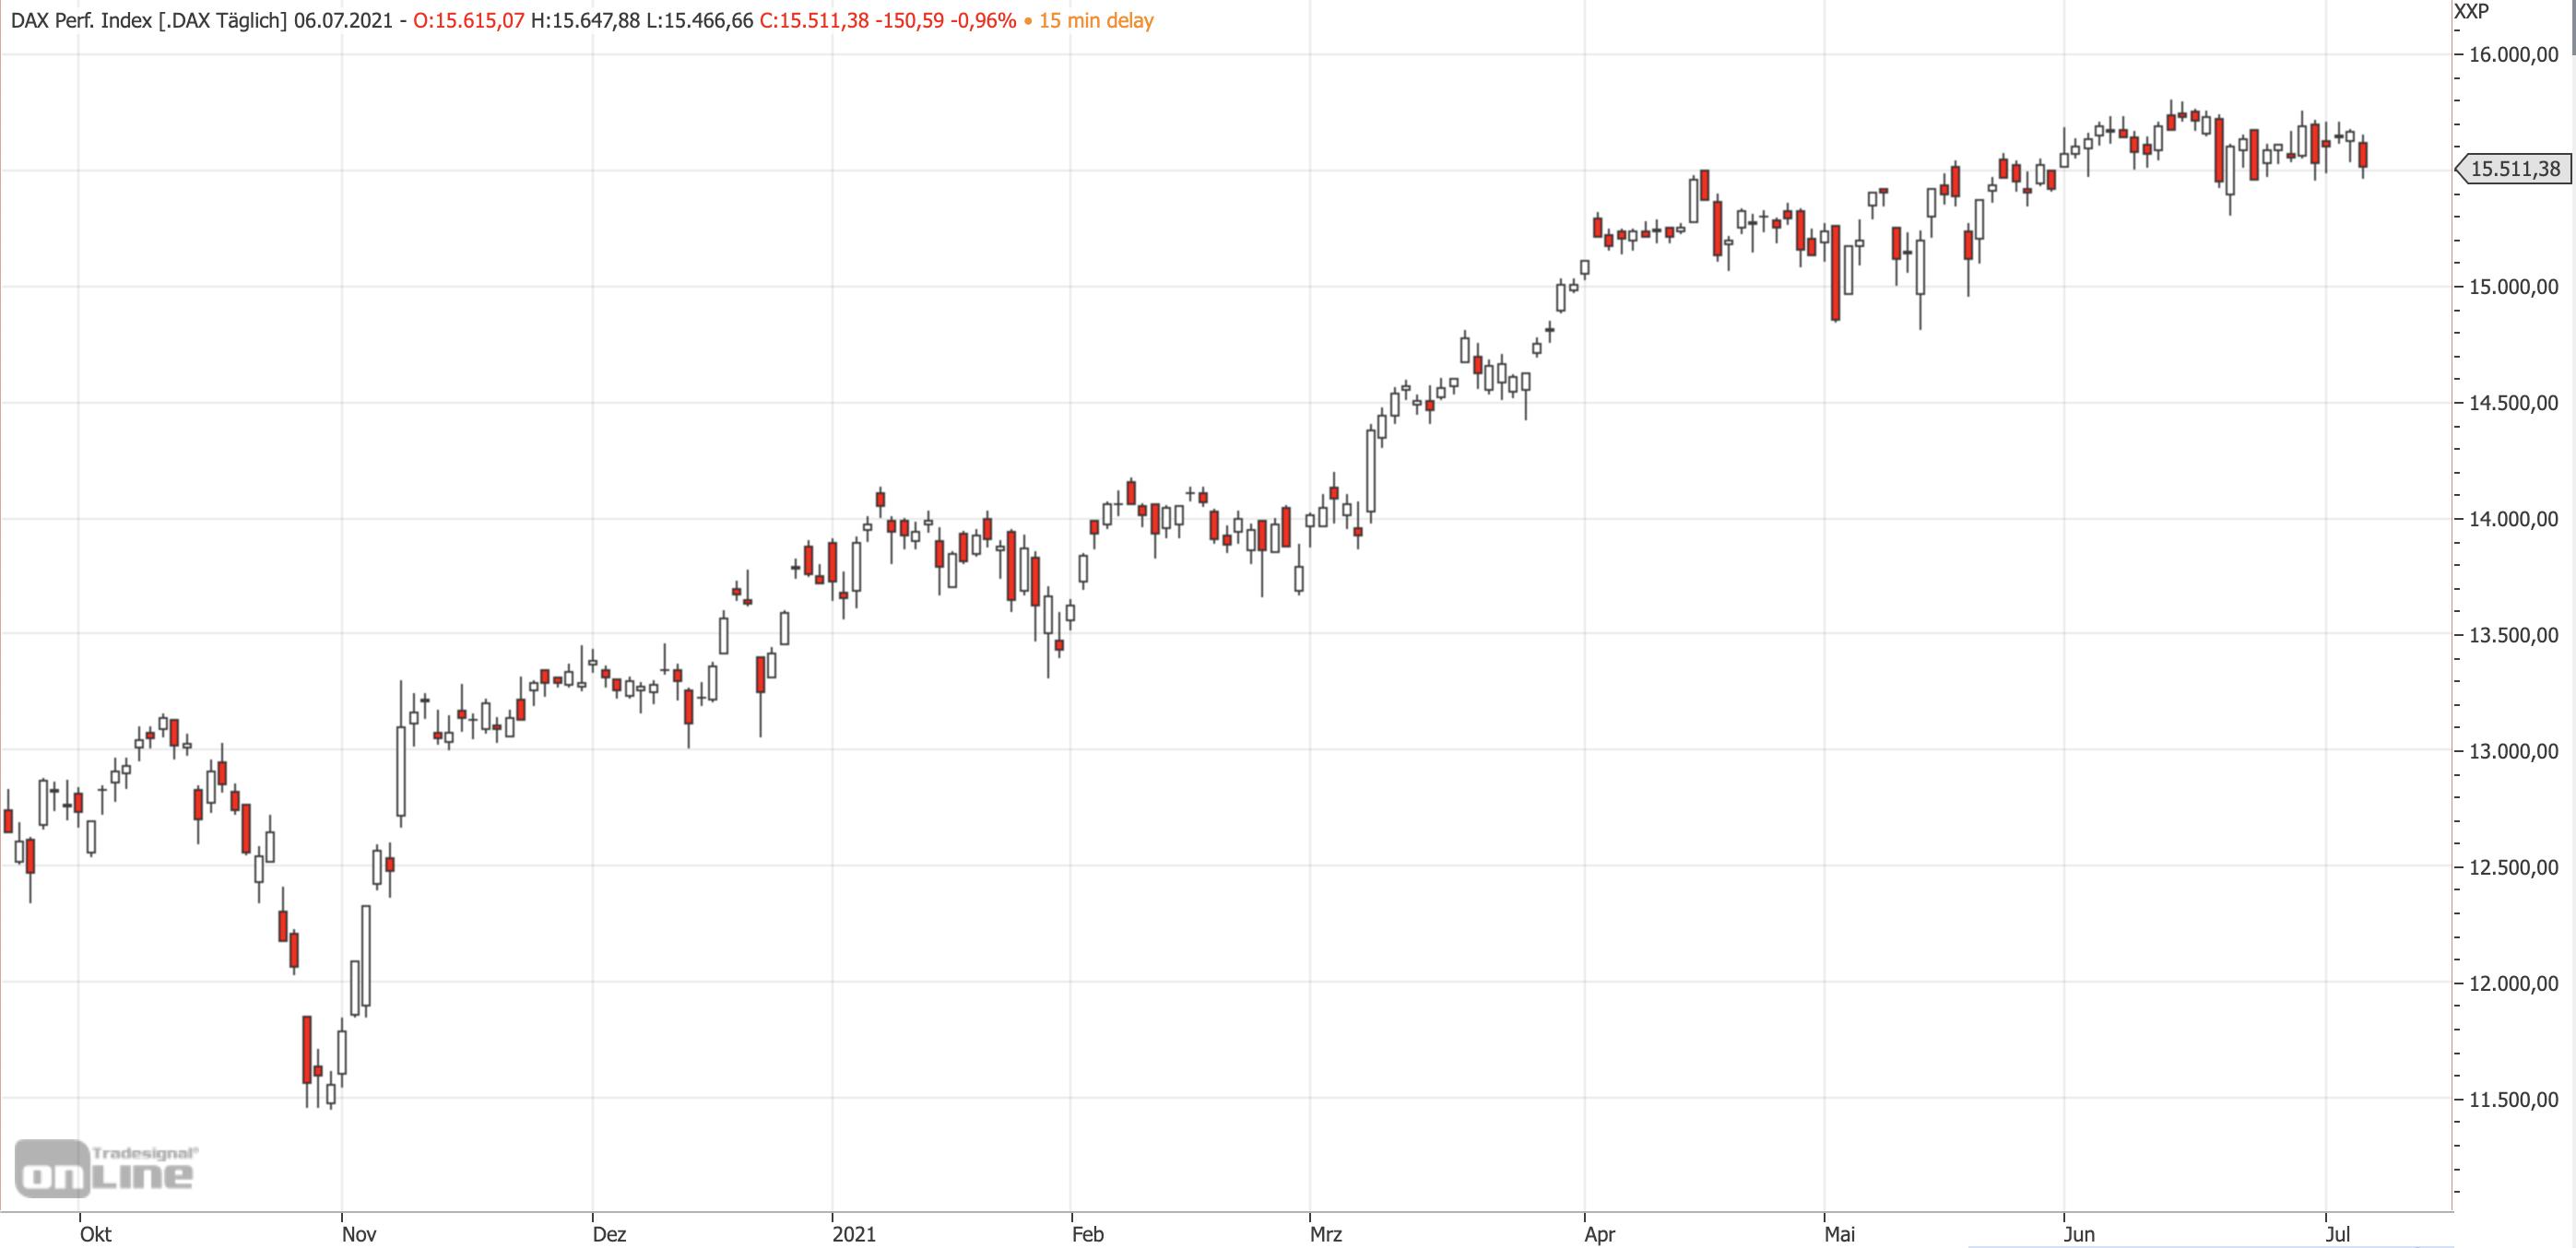 Mittelfristiger DAX-Chart am 06.07.2021